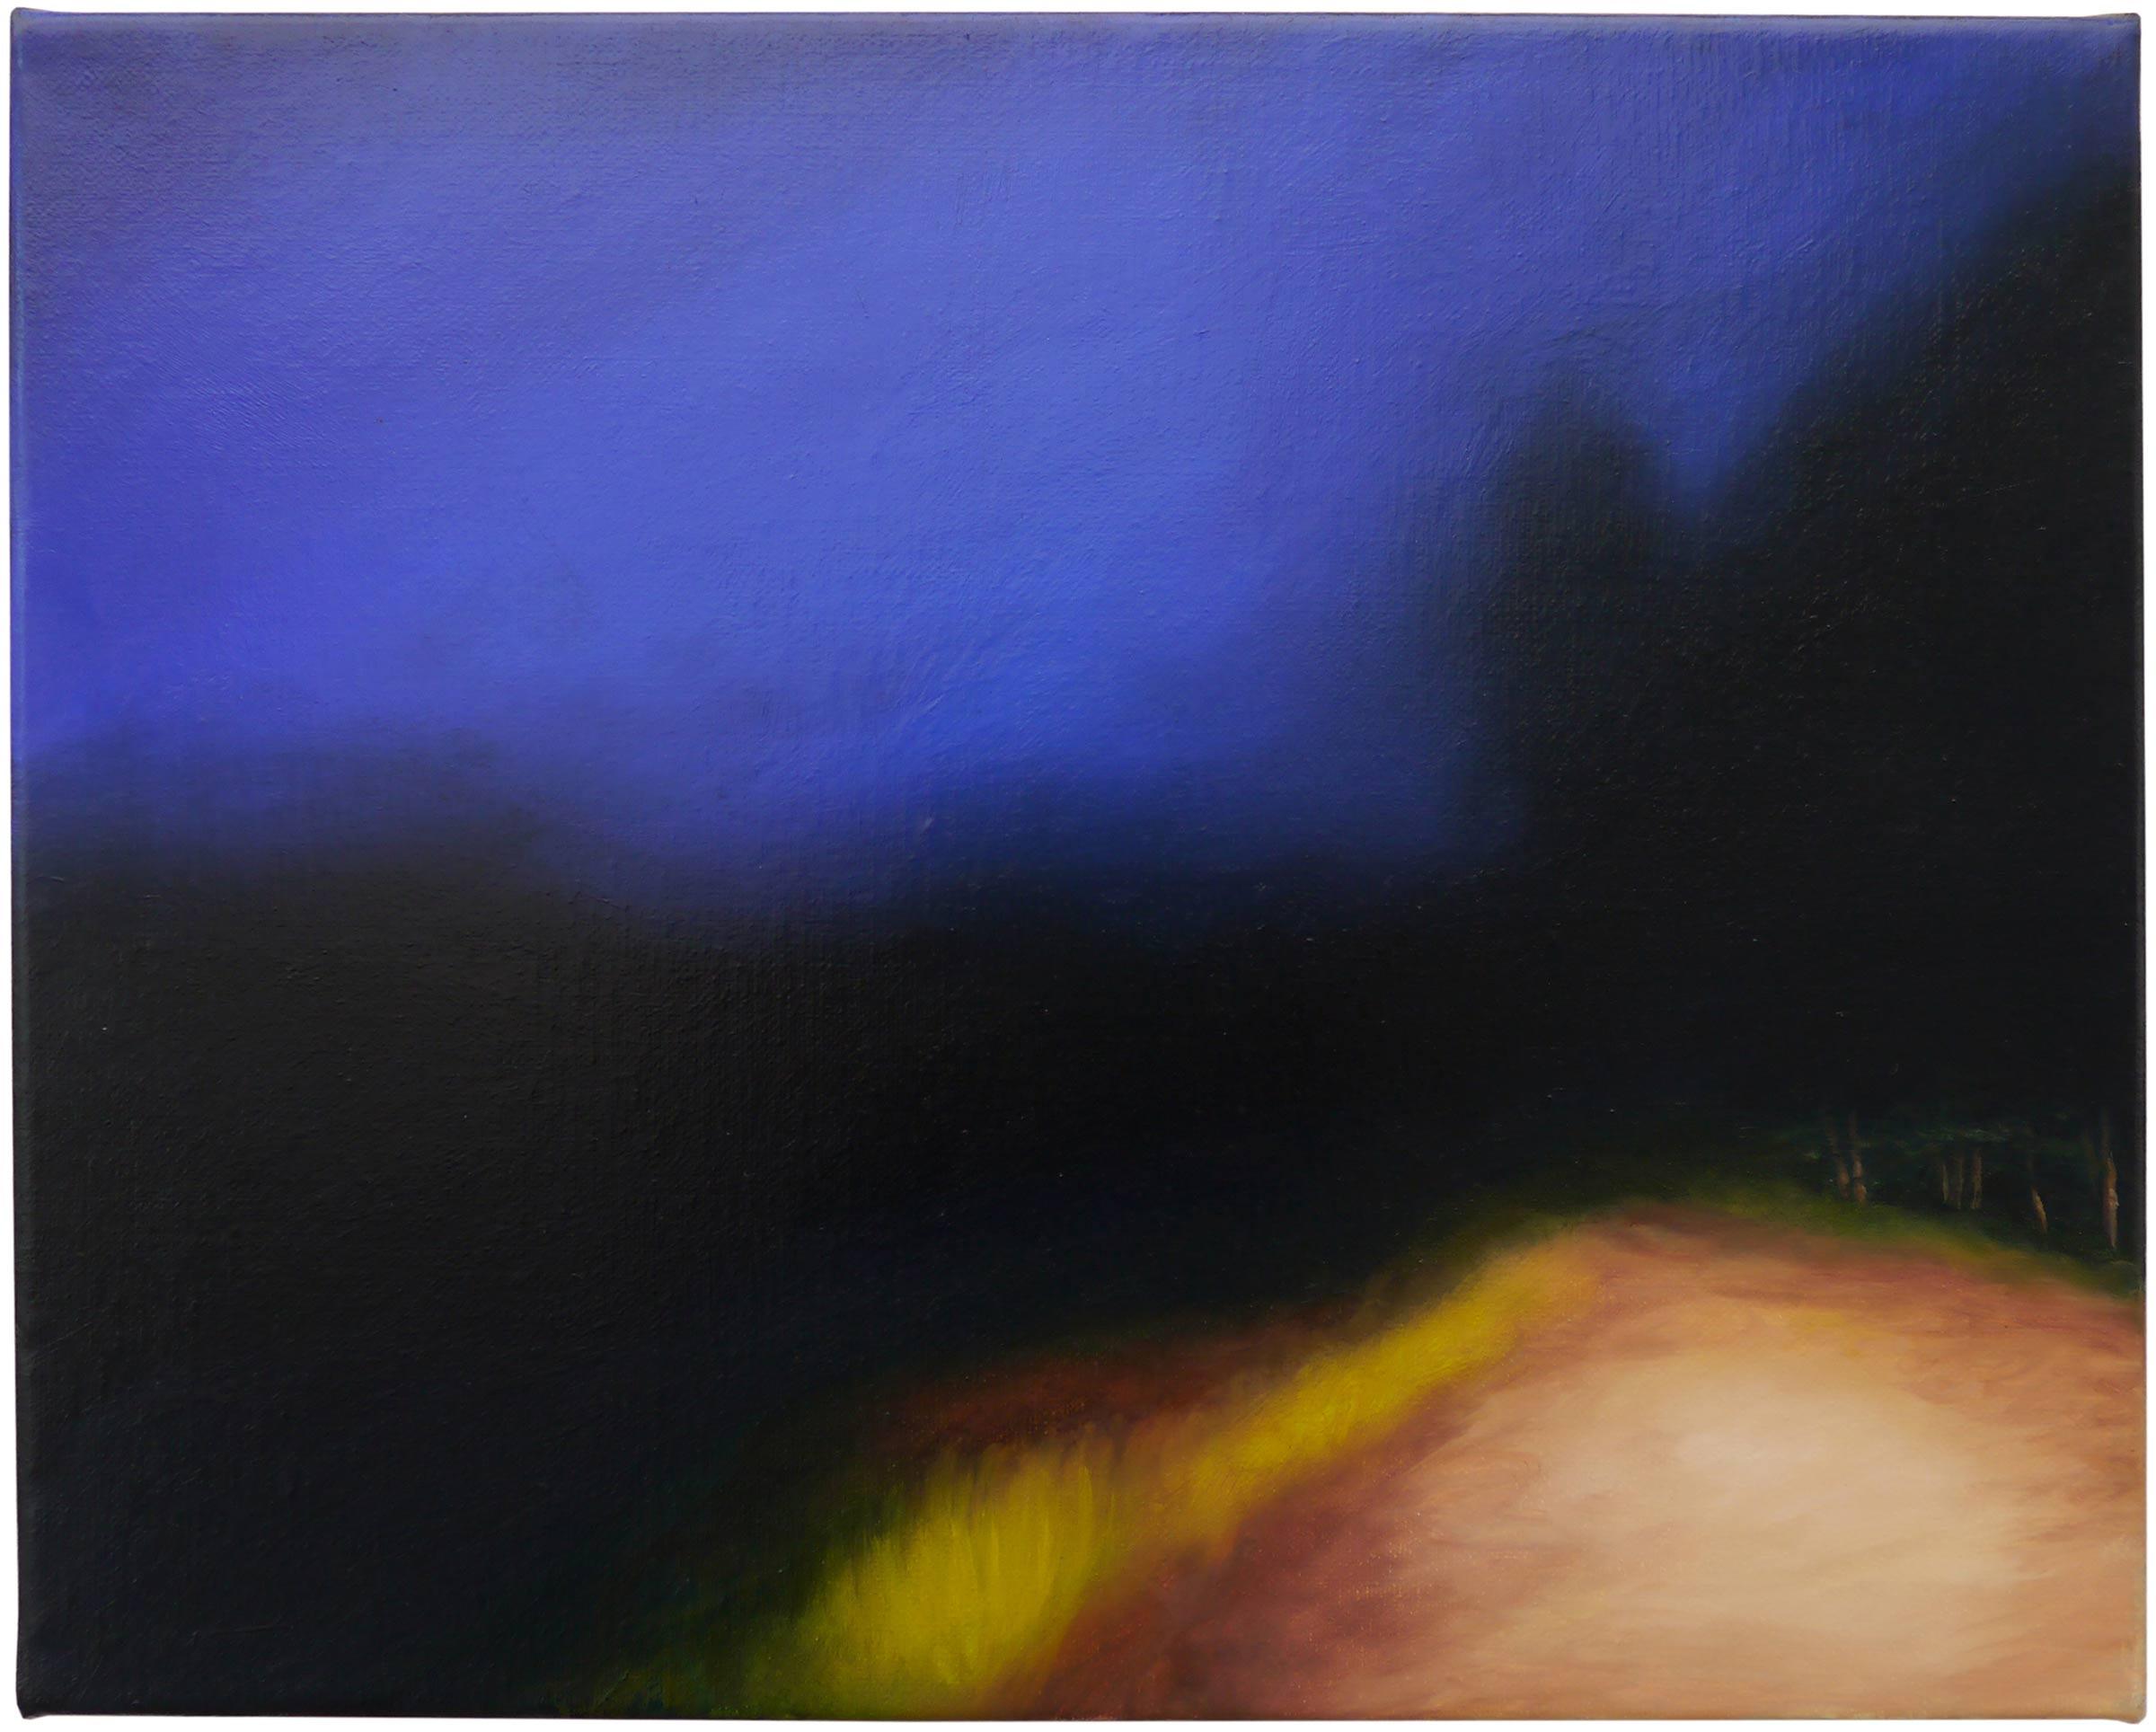 The shadows beyond 3, oil on linen, 30cm x 24cm, 2021